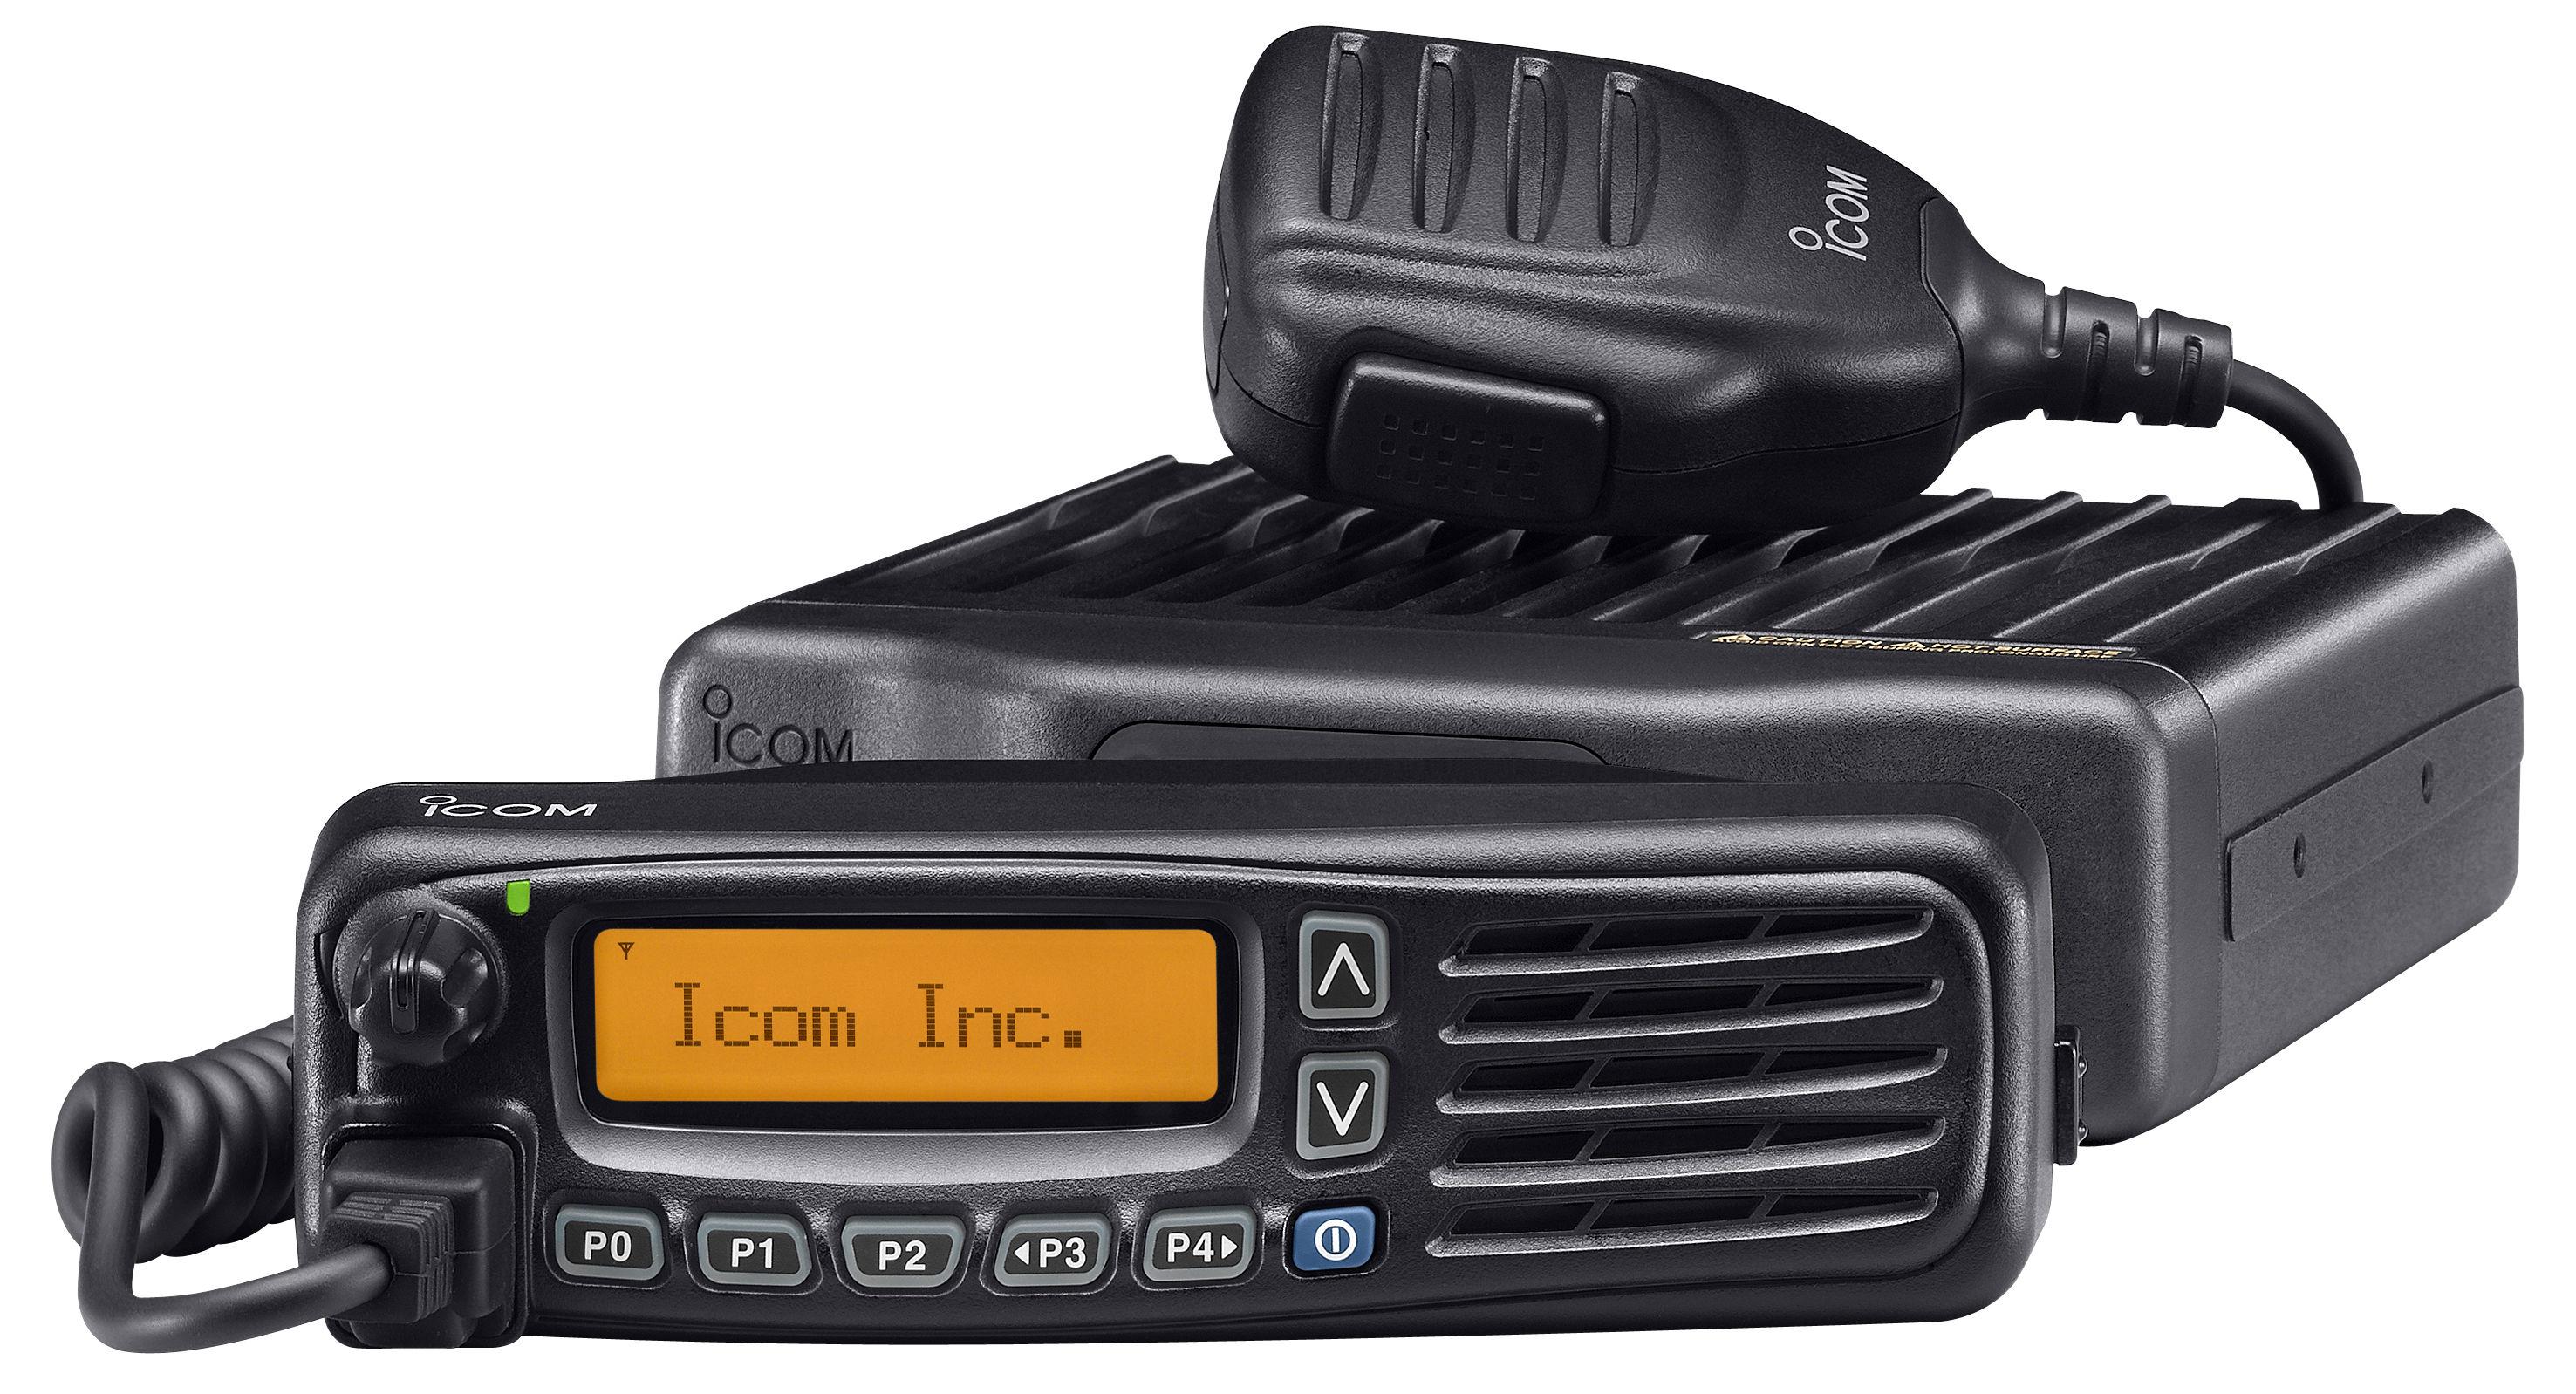 ICOM IC-F5062: Catálogo de Olanni Electronics